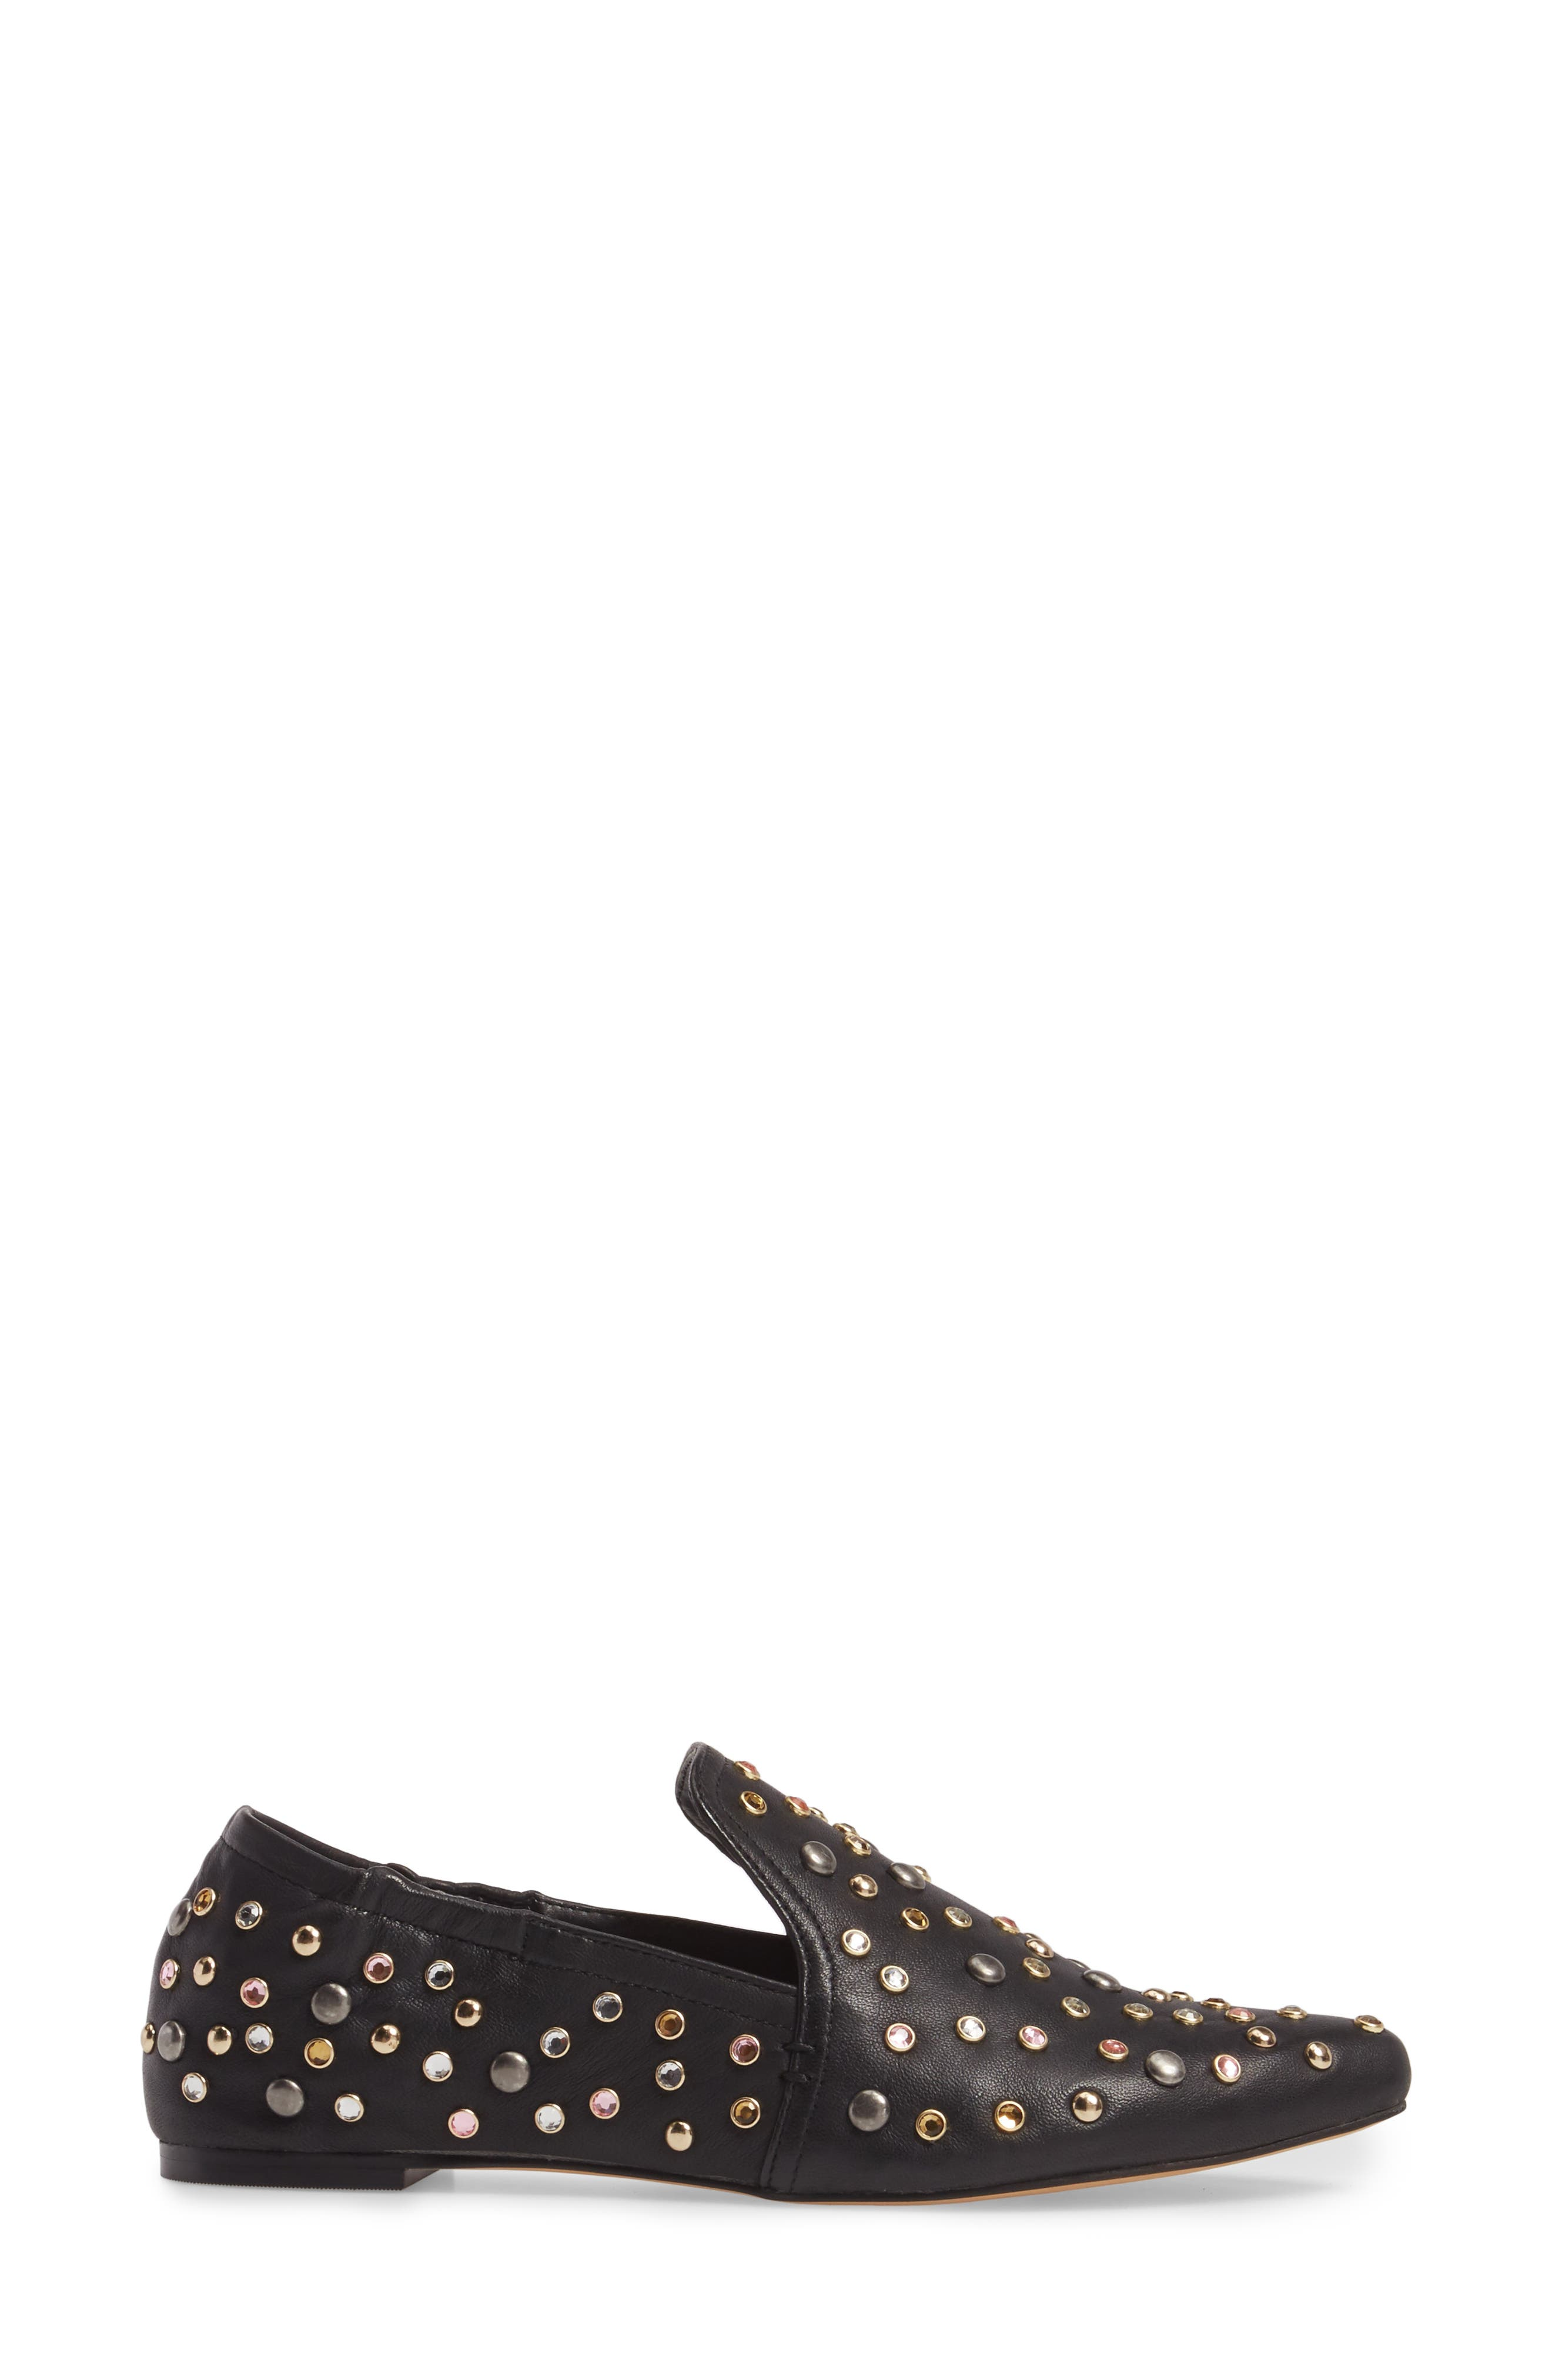 Alternate Image 3  - Dolce Vita Hamond Stud Embellished Loafer Flat (Women)